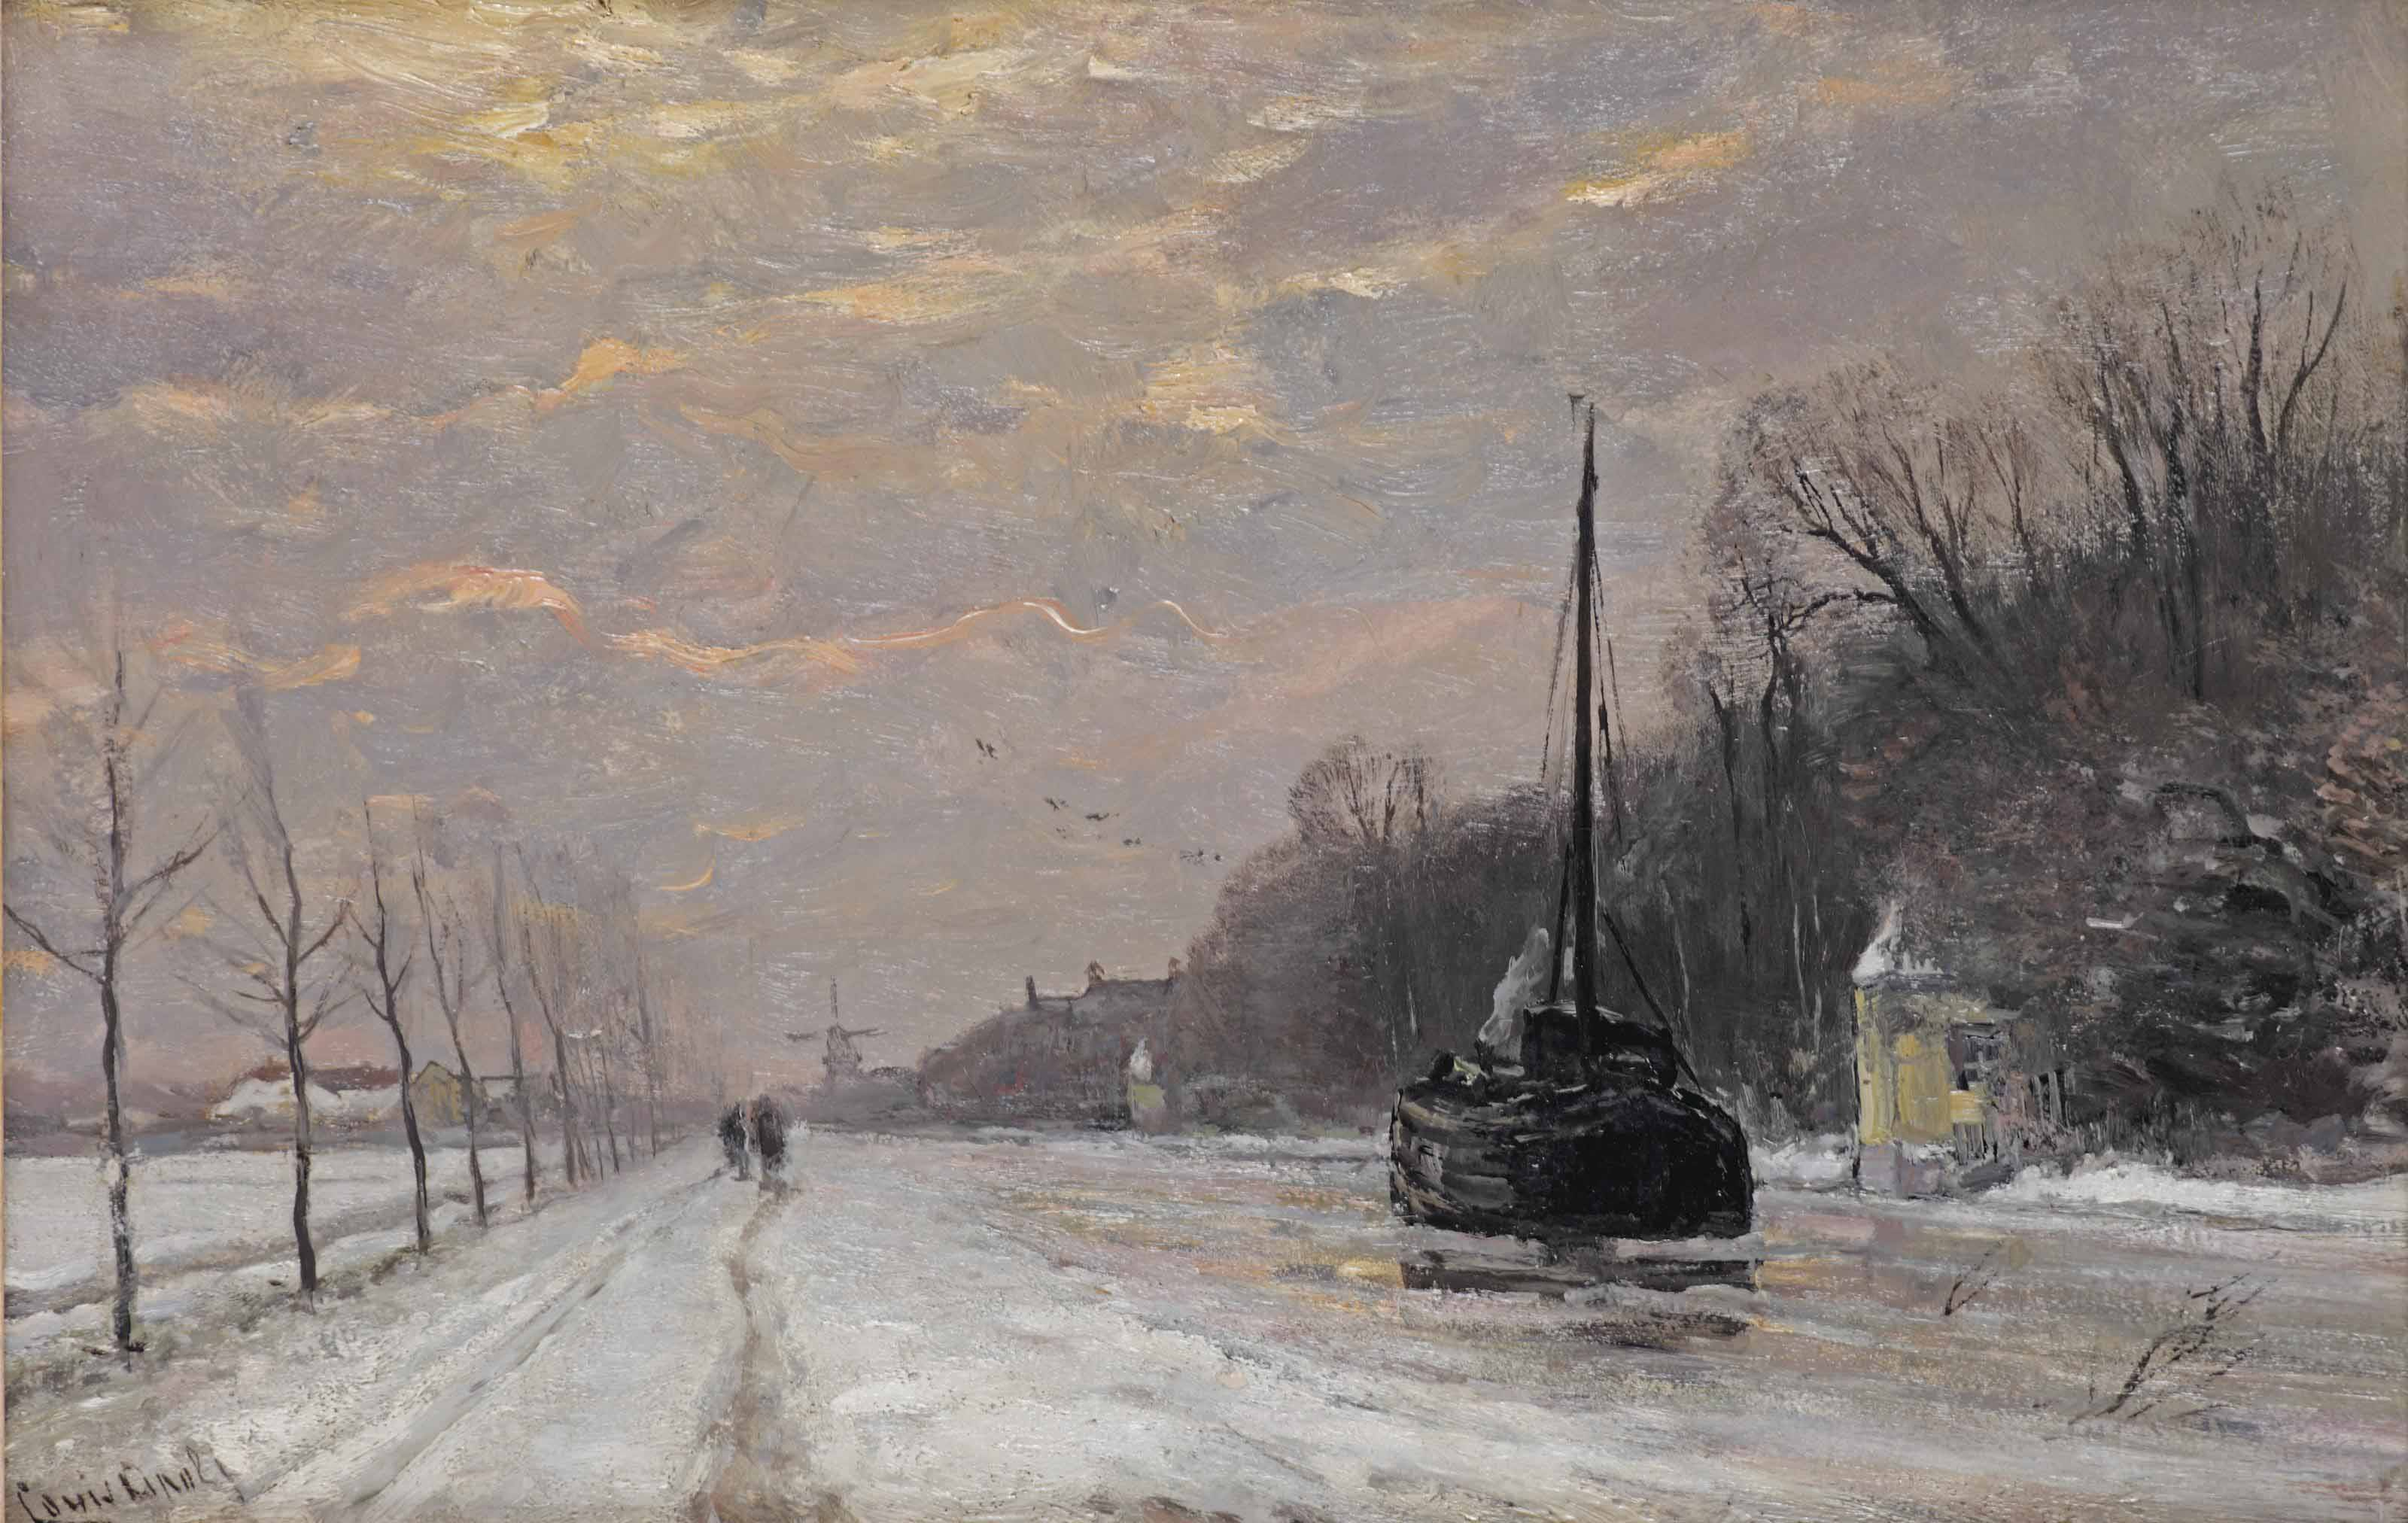 Louis Apol (The Hague 1850-193